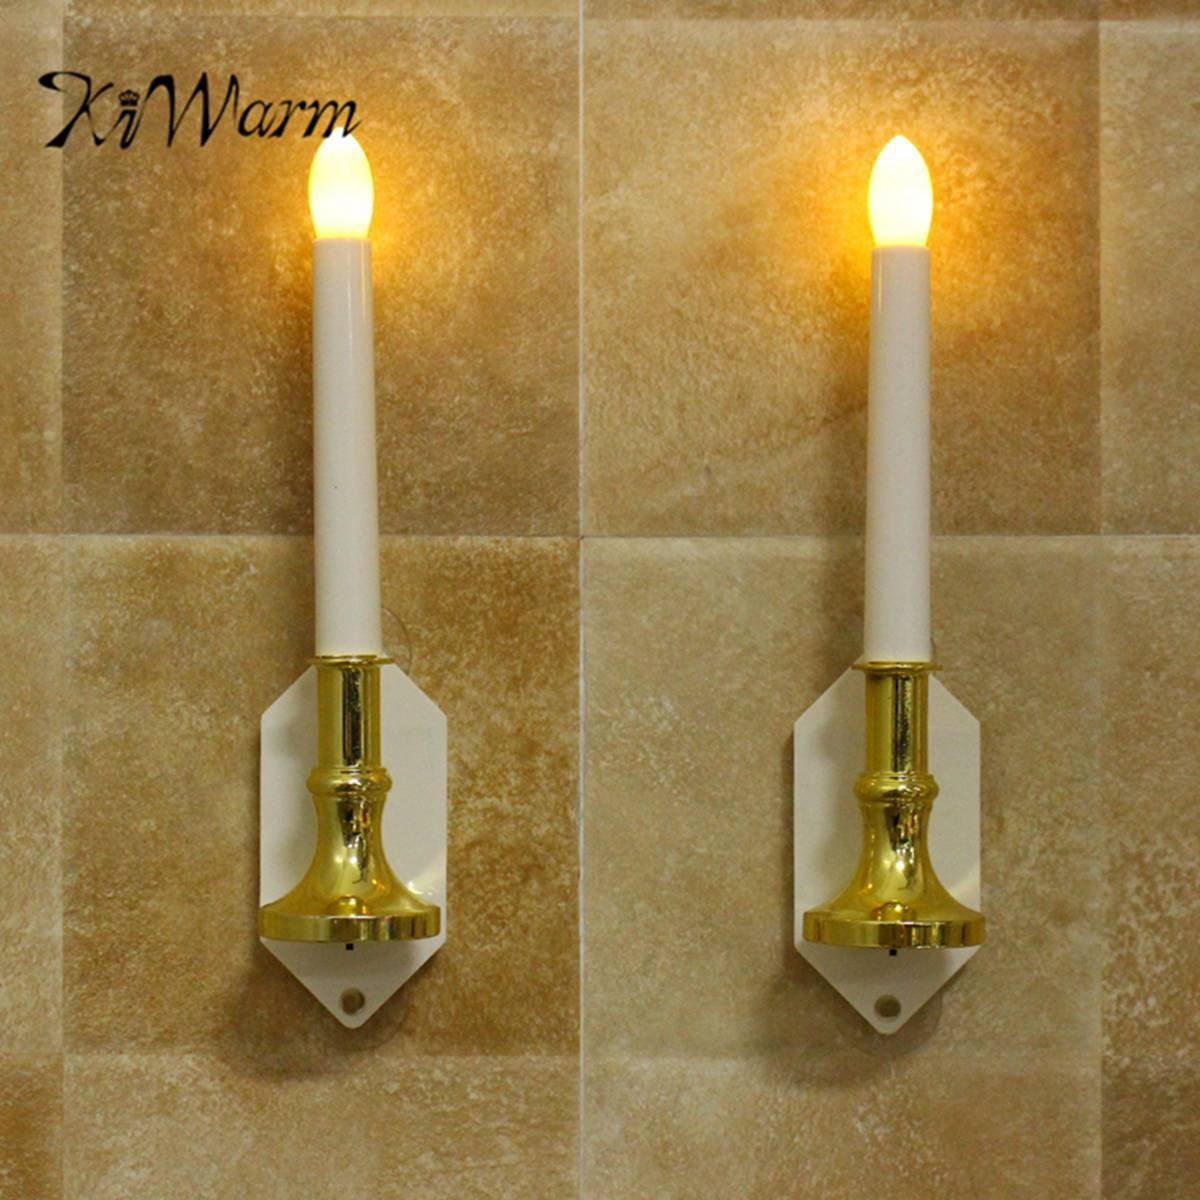 zilzol 2pcs Solar LED Candle Light Automatic Sensing Outdoor Waterproof Wall Lamp Window DecorThanksgiving Christmas Party Decor